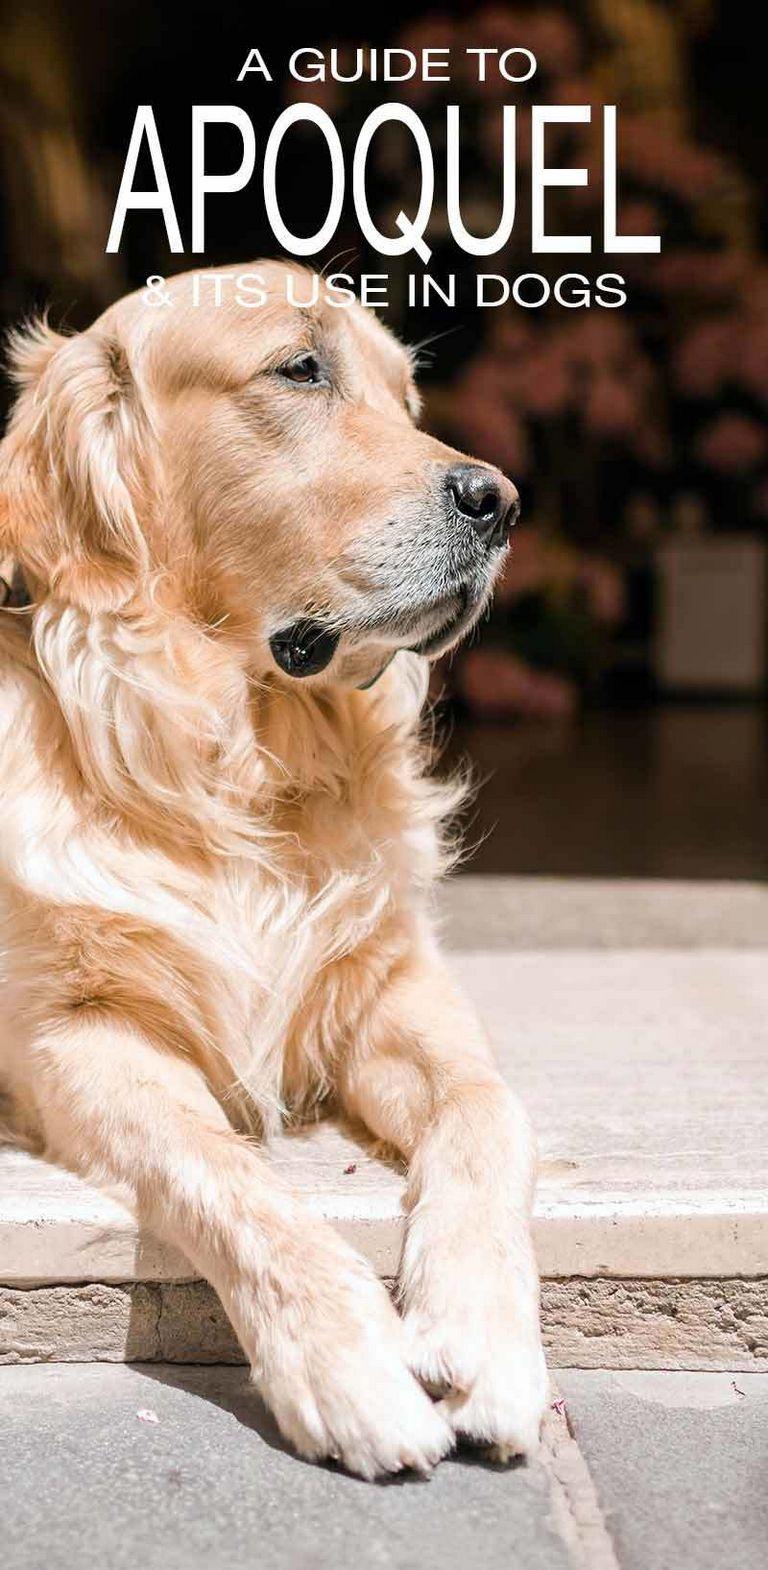 Apoquel Alternatives For Dogs